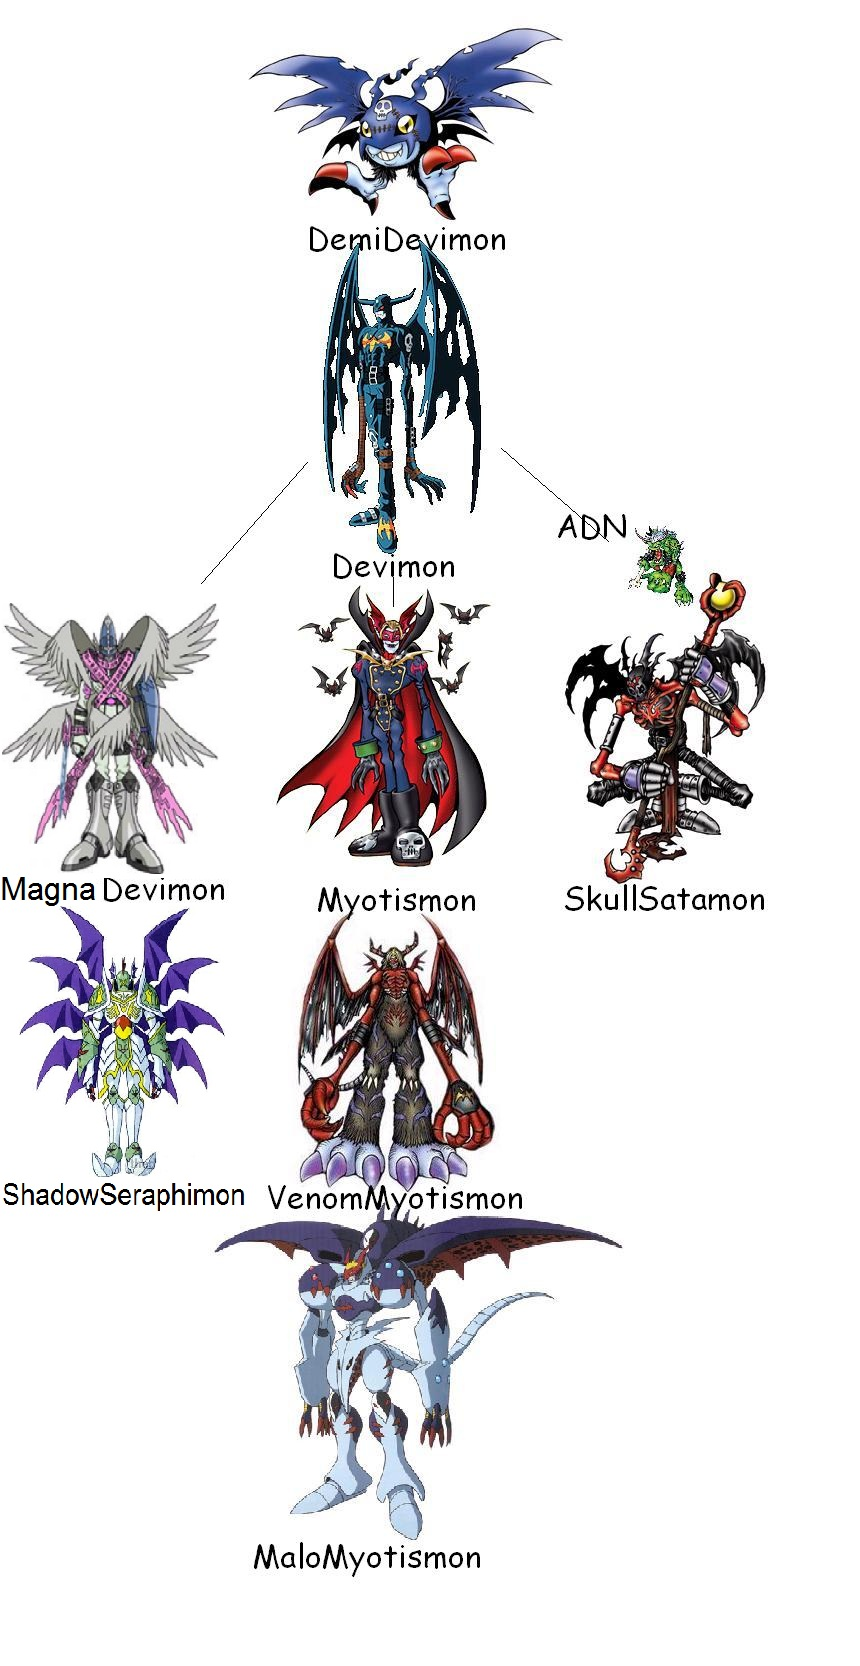 Demidevimon Evolution Line Image - Demidevimon li...